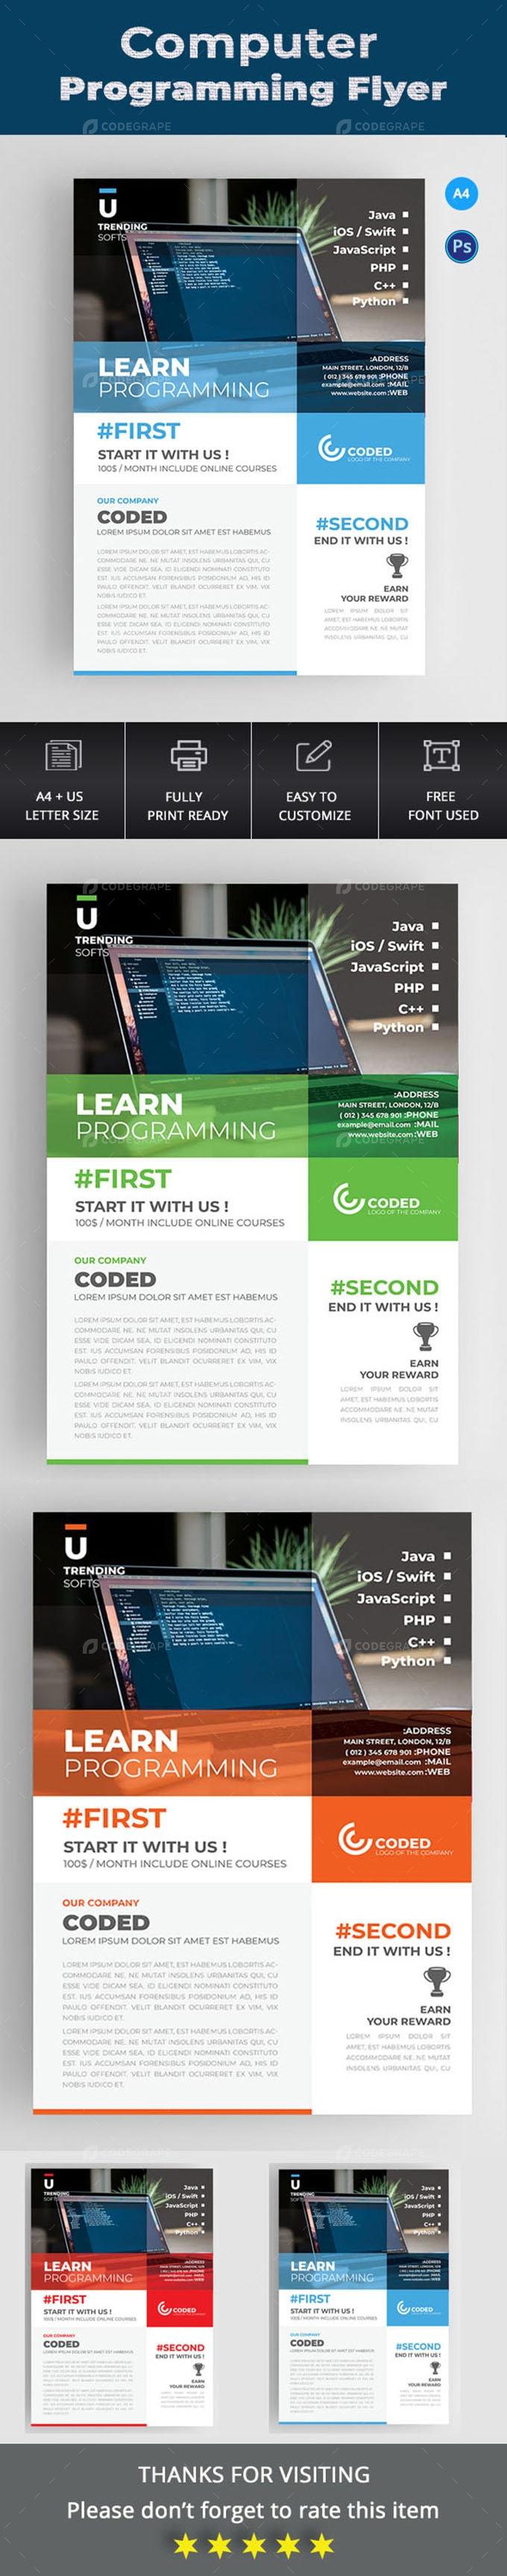 Computer Programming Flyer.